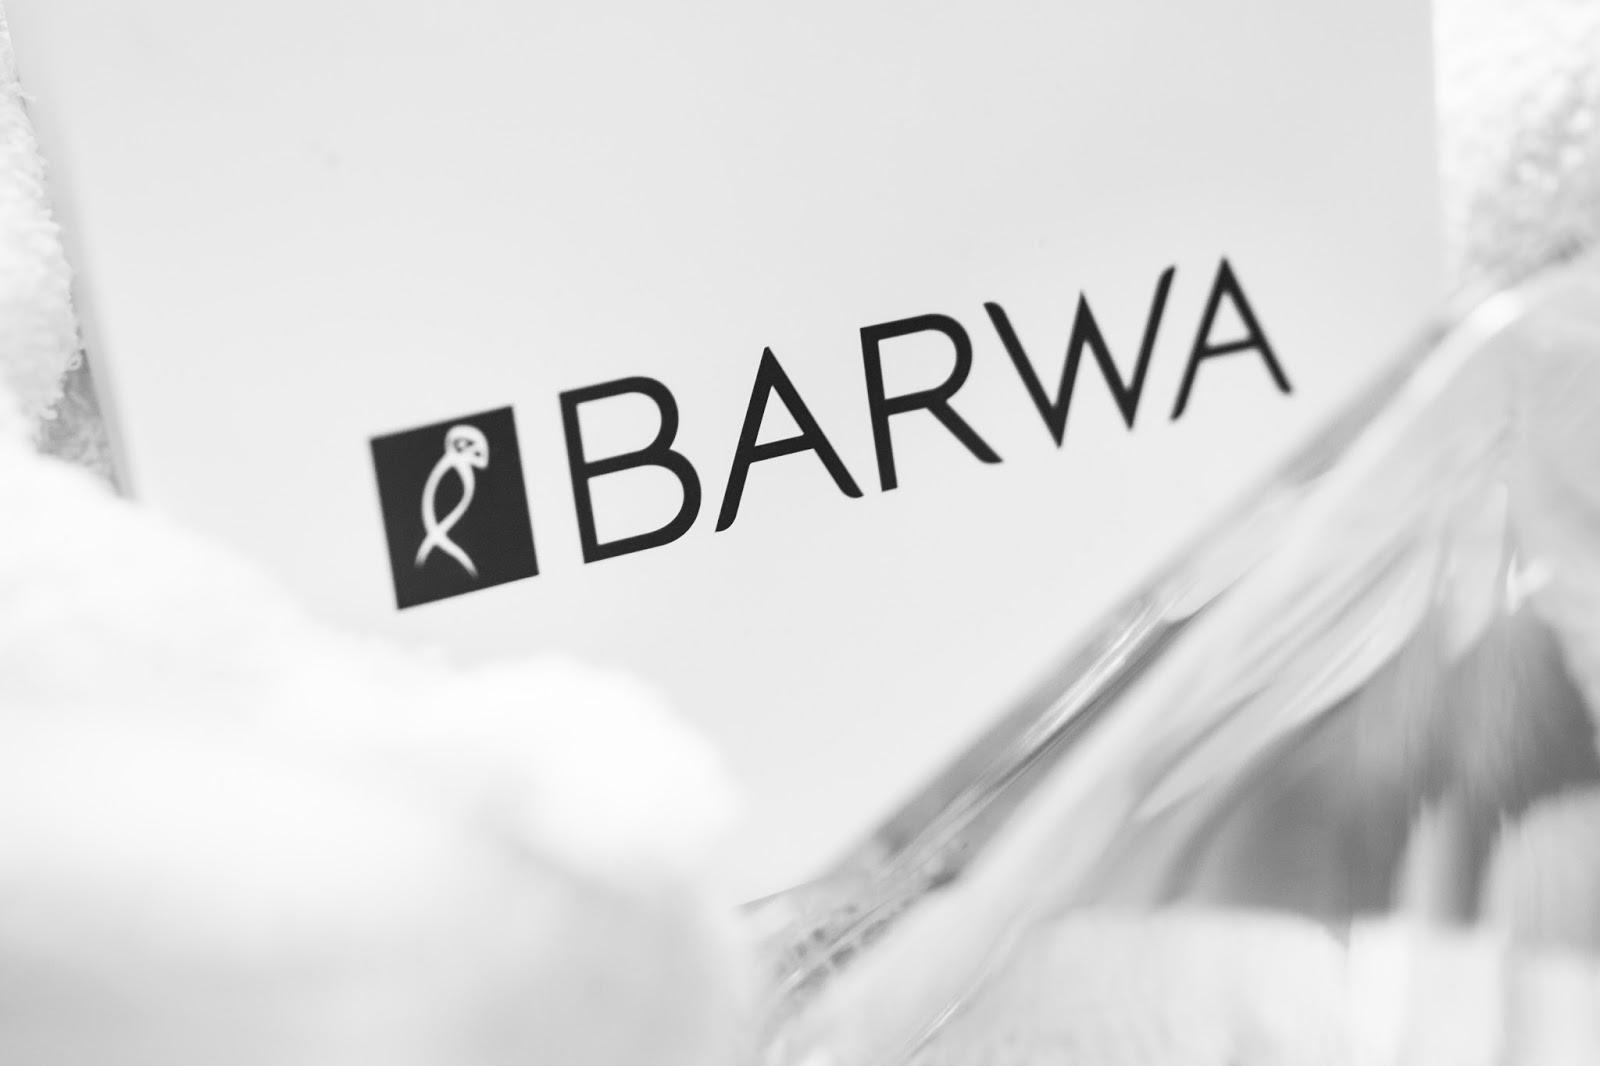 BARWA INTYMNA